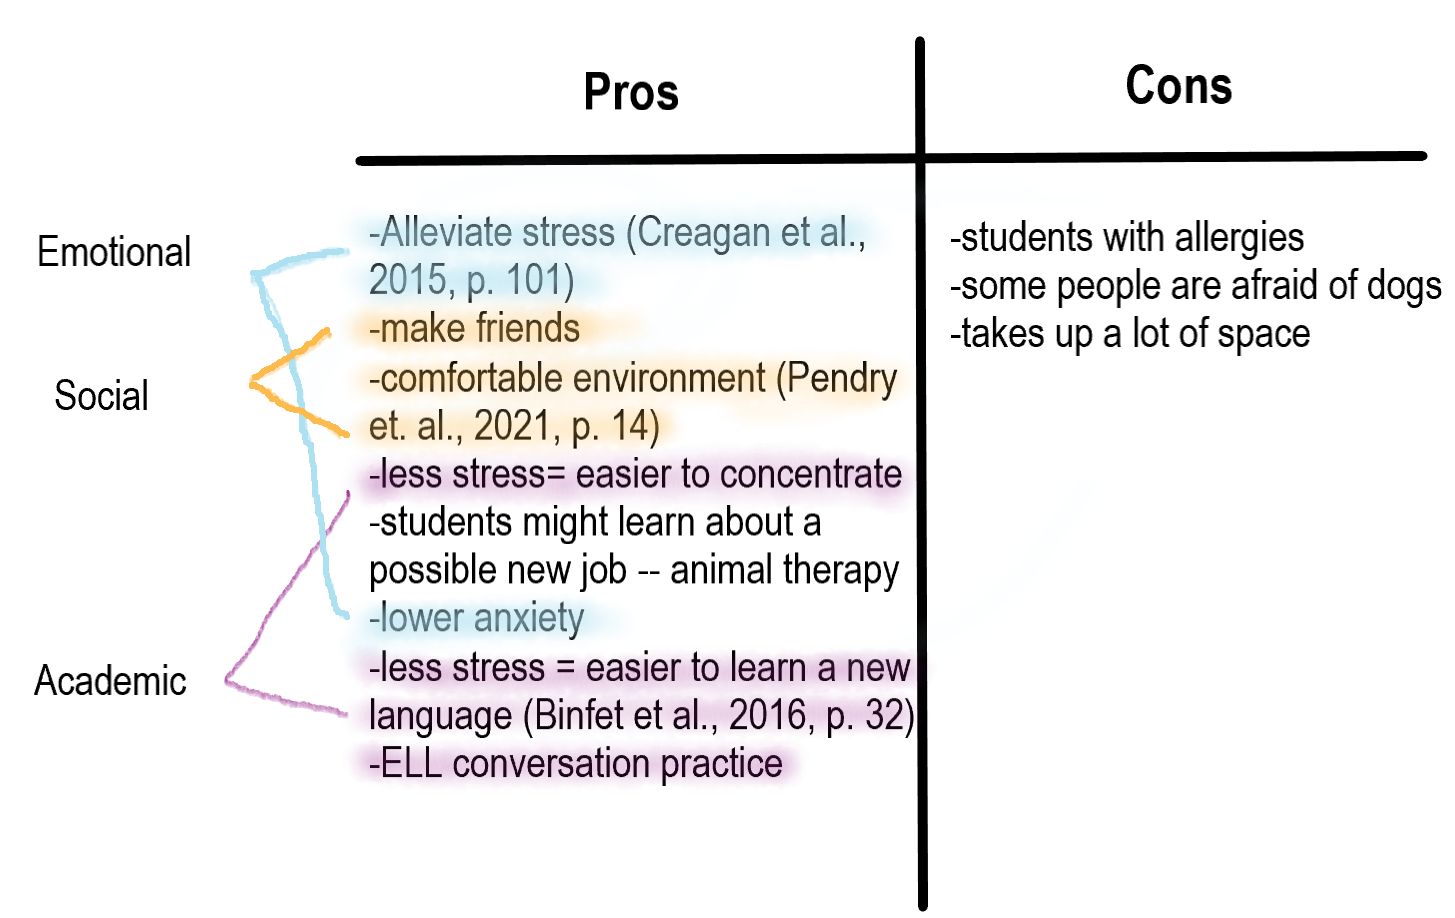 sample pro/con list with similar ideas colour coded